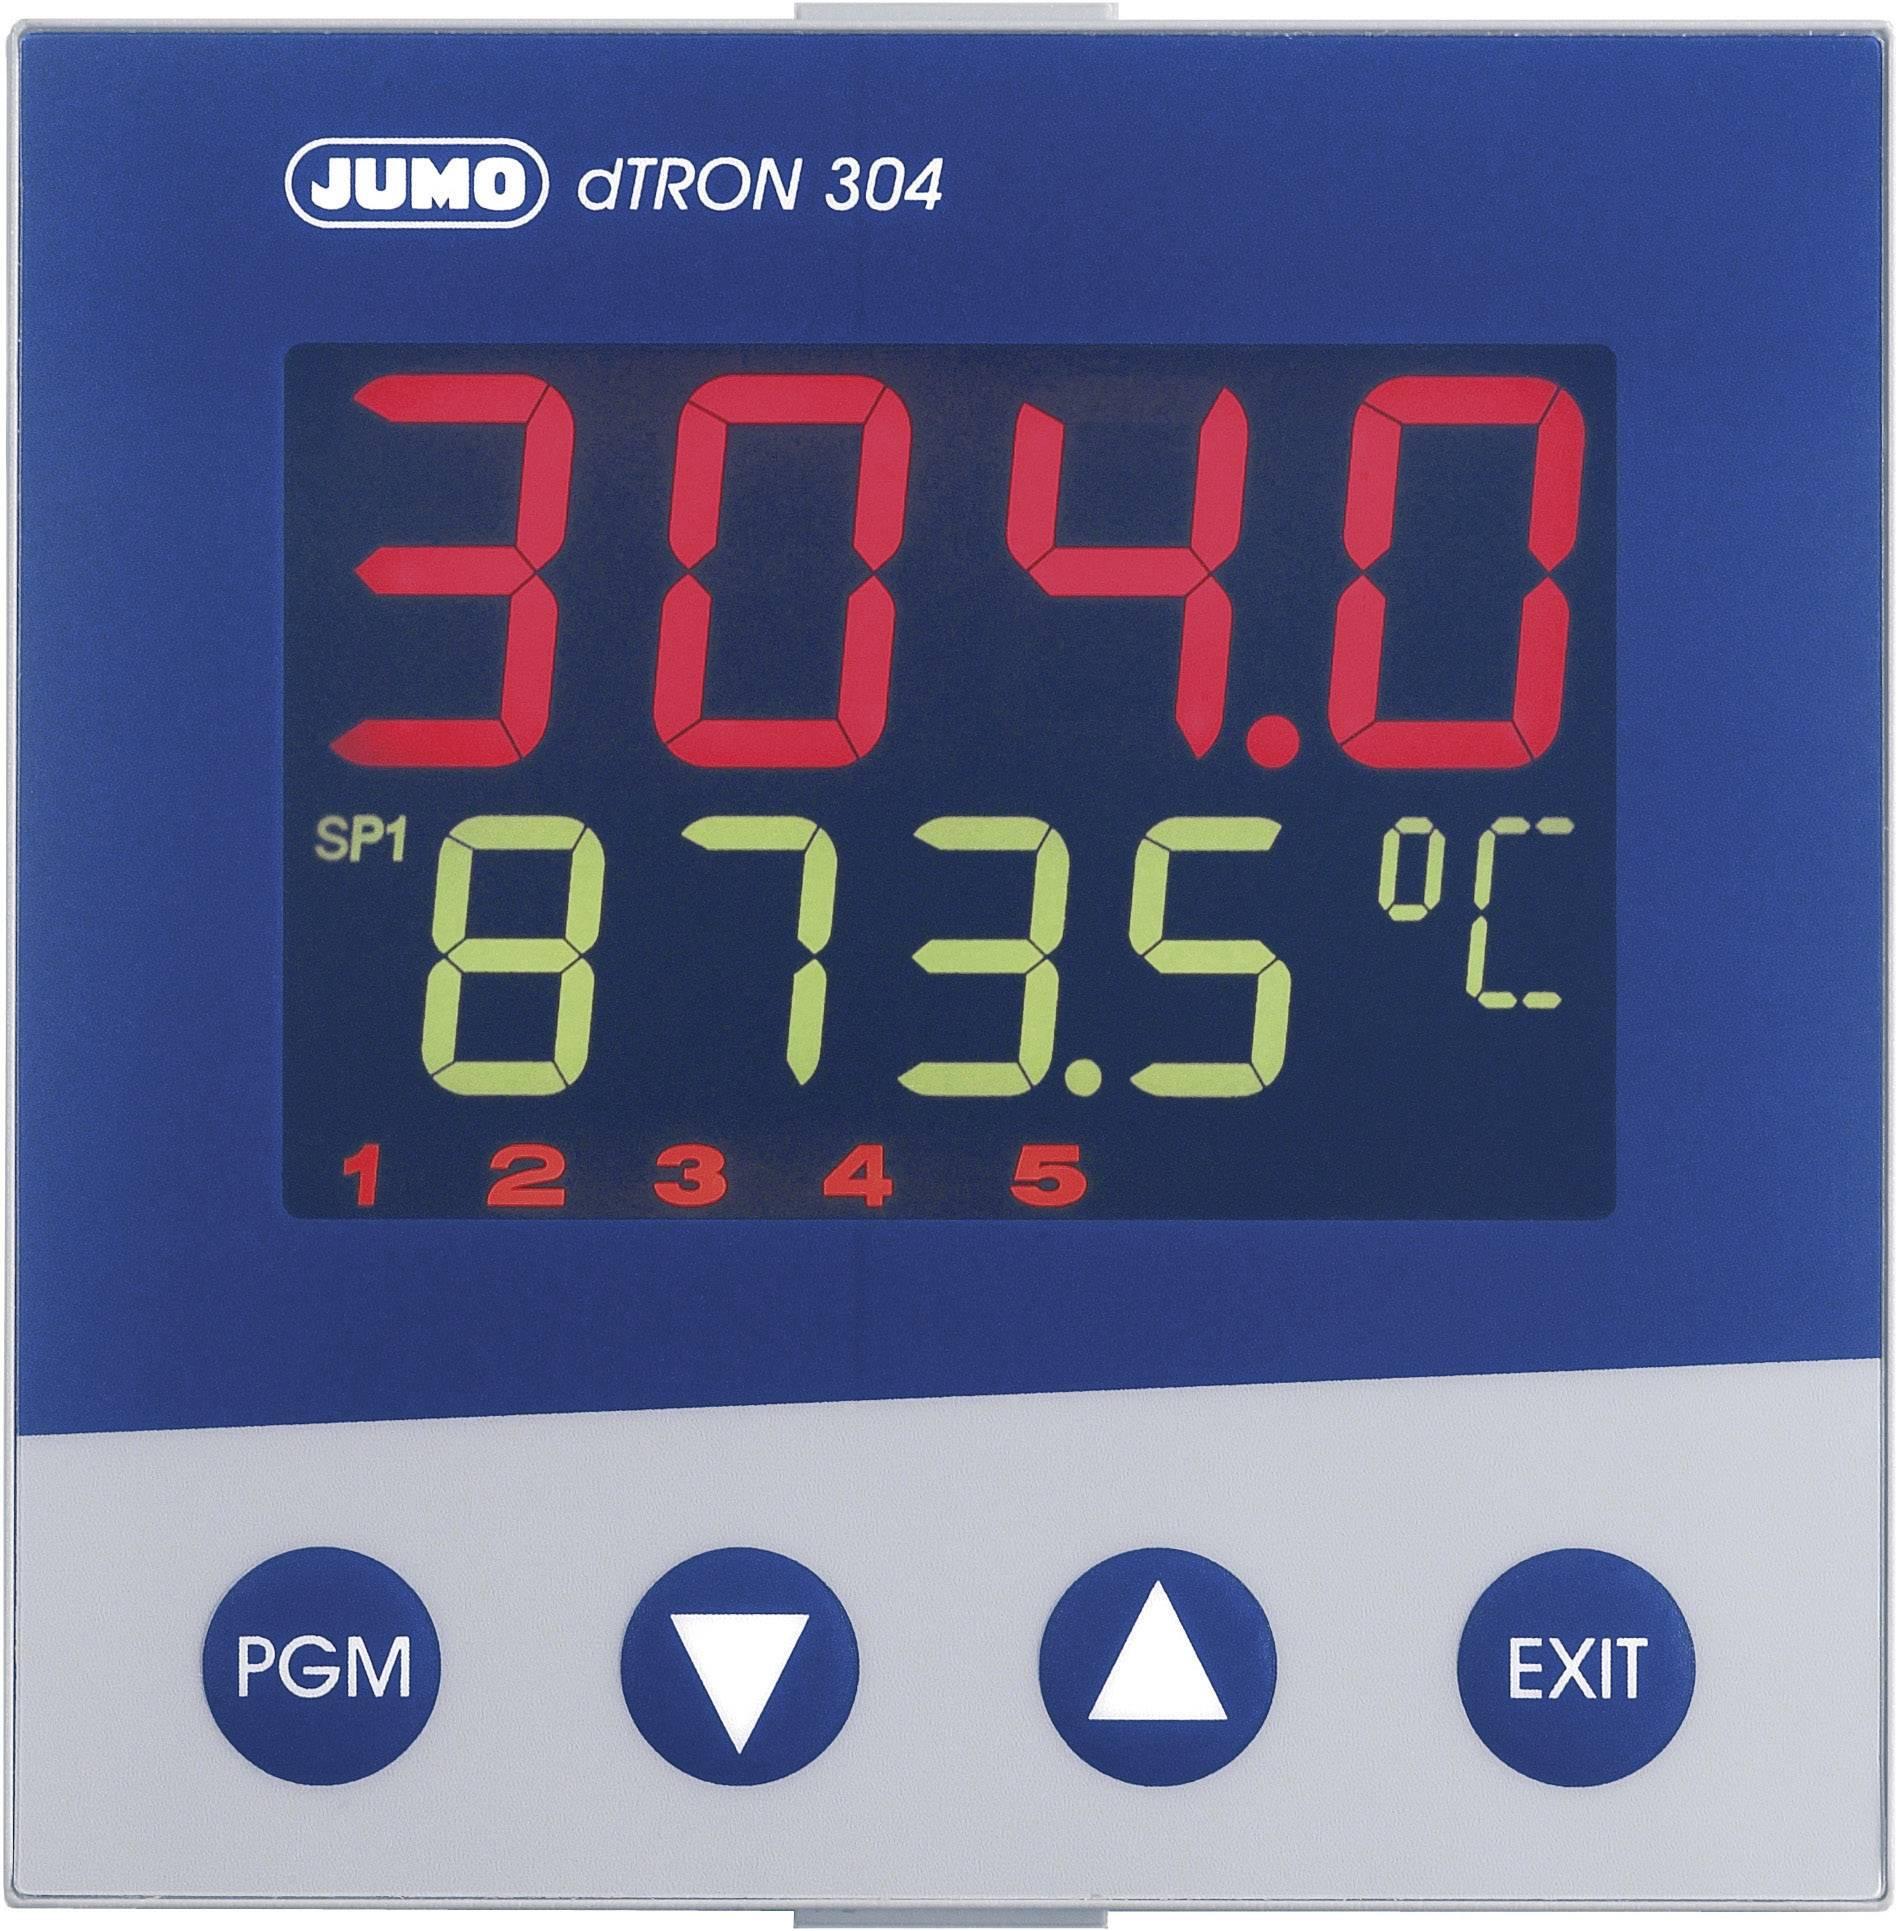 Panelový termostat JUMO dTRON 304, 110 - 240 VAC, 92 x 92 mm